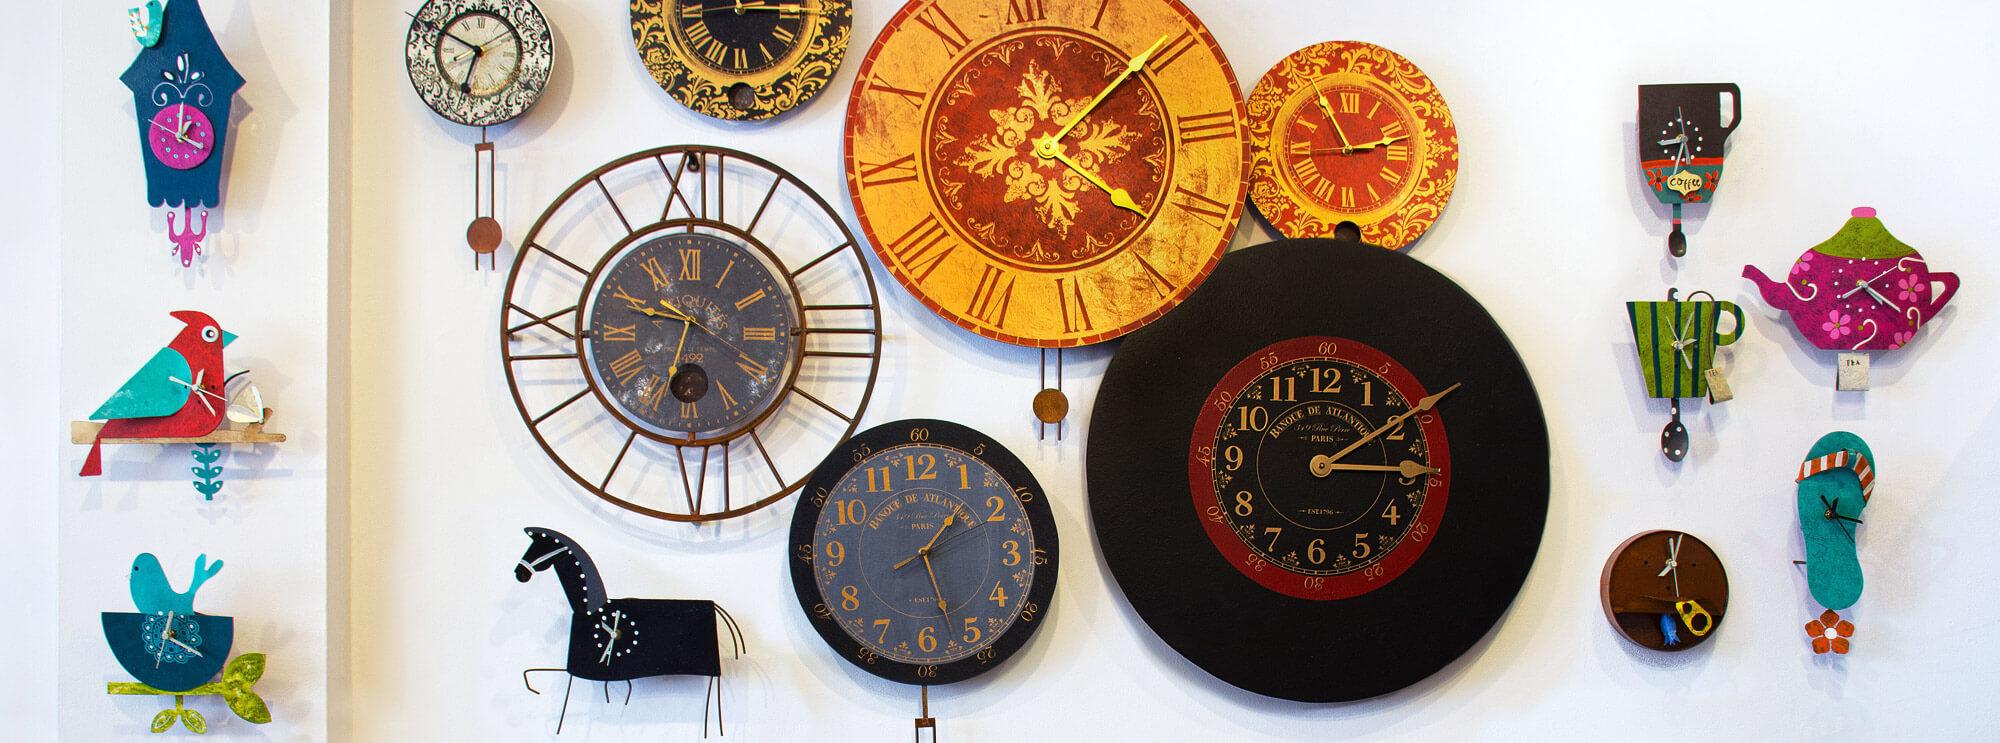 Óxidos Clocks